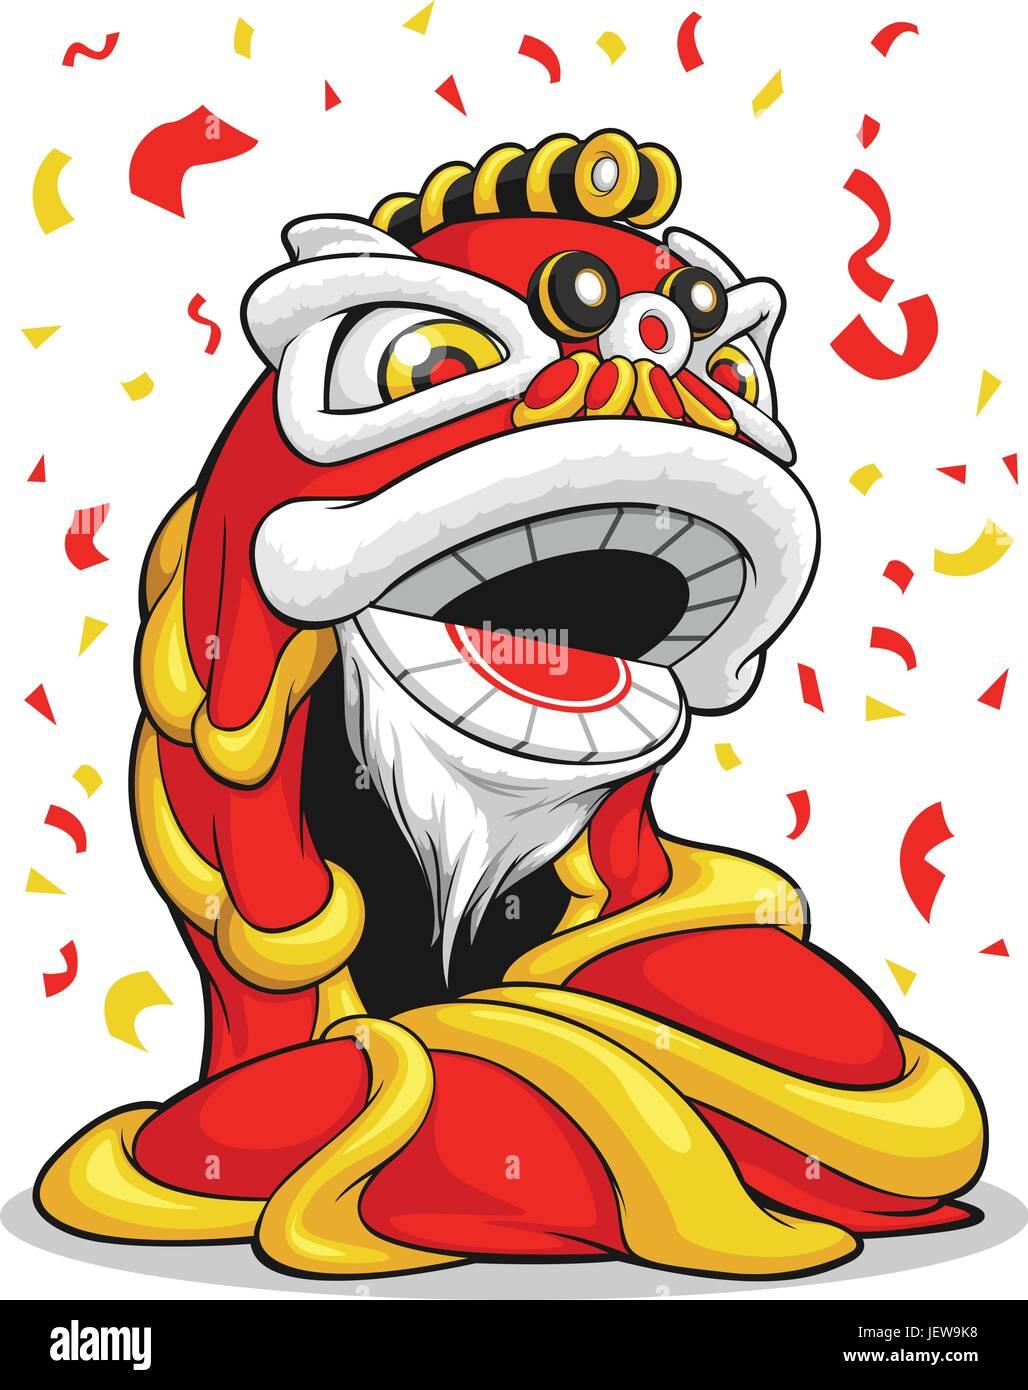 lion, cat, big cat, feline predator, party, celebration, china, chinese, new - Stock Vector